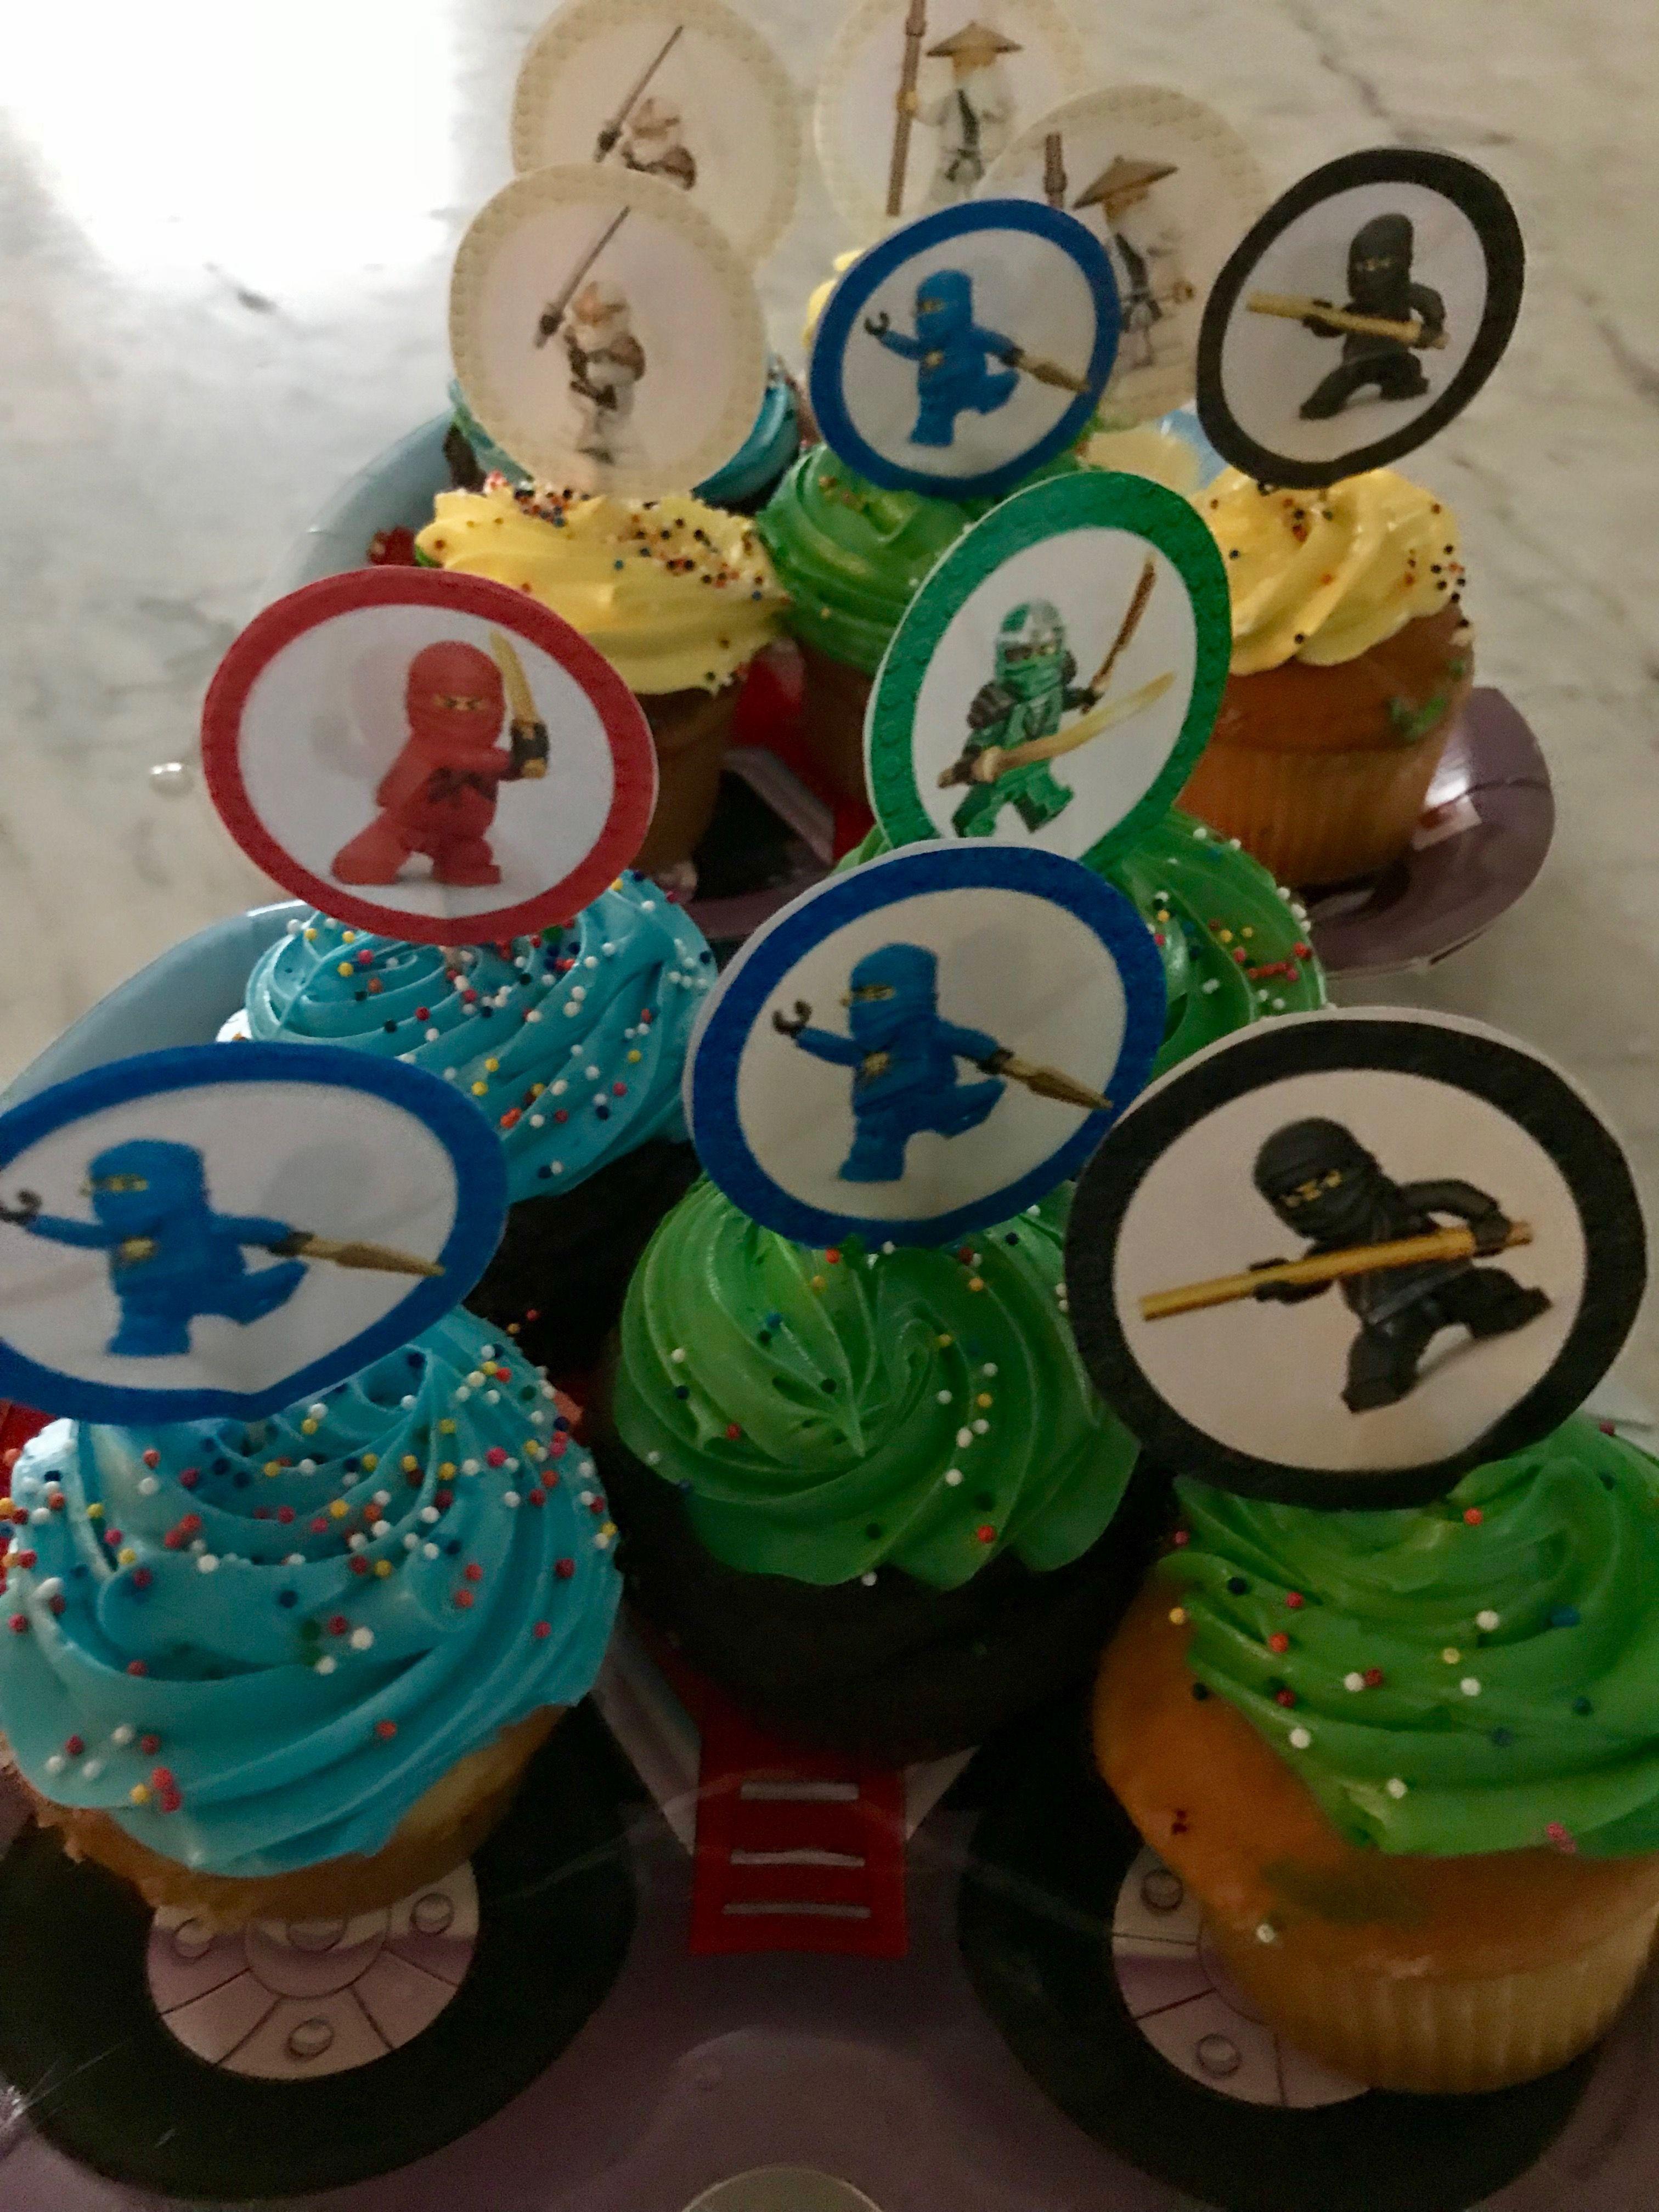 Lego ninjago cupcakes - easy to do with printable topper ...